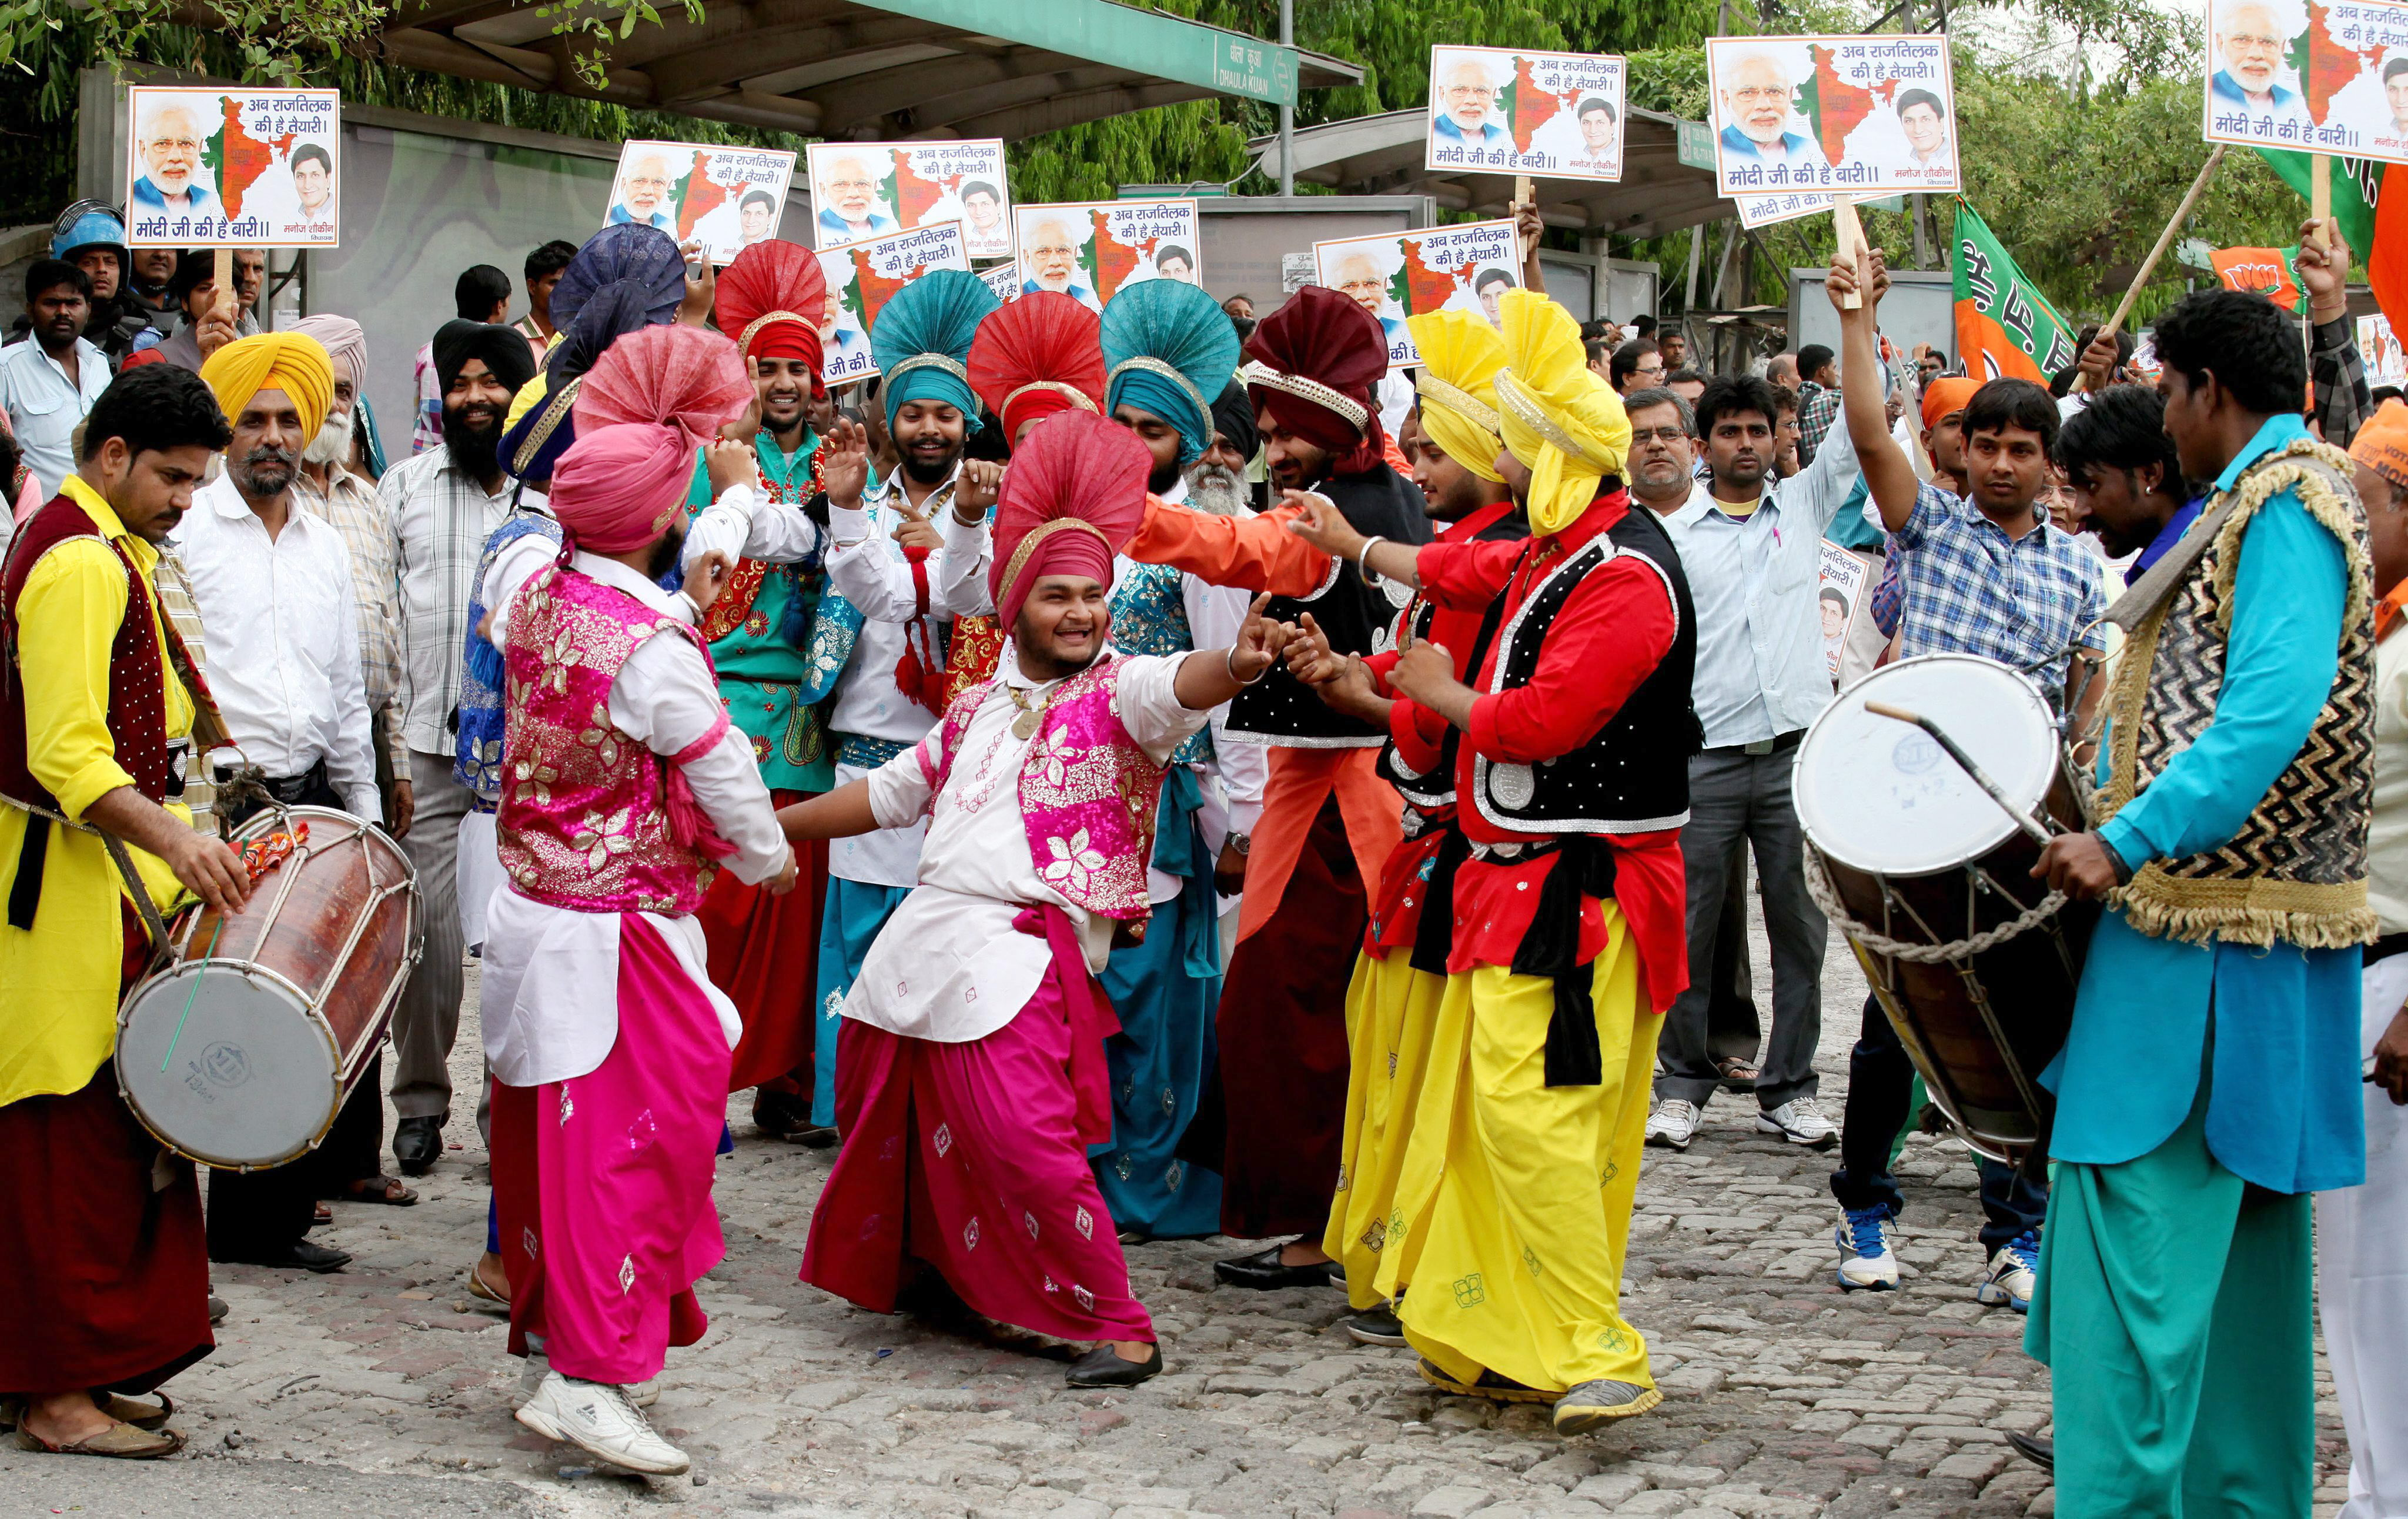 Nueva Delhi recibe a Narendra Modi entre vítores